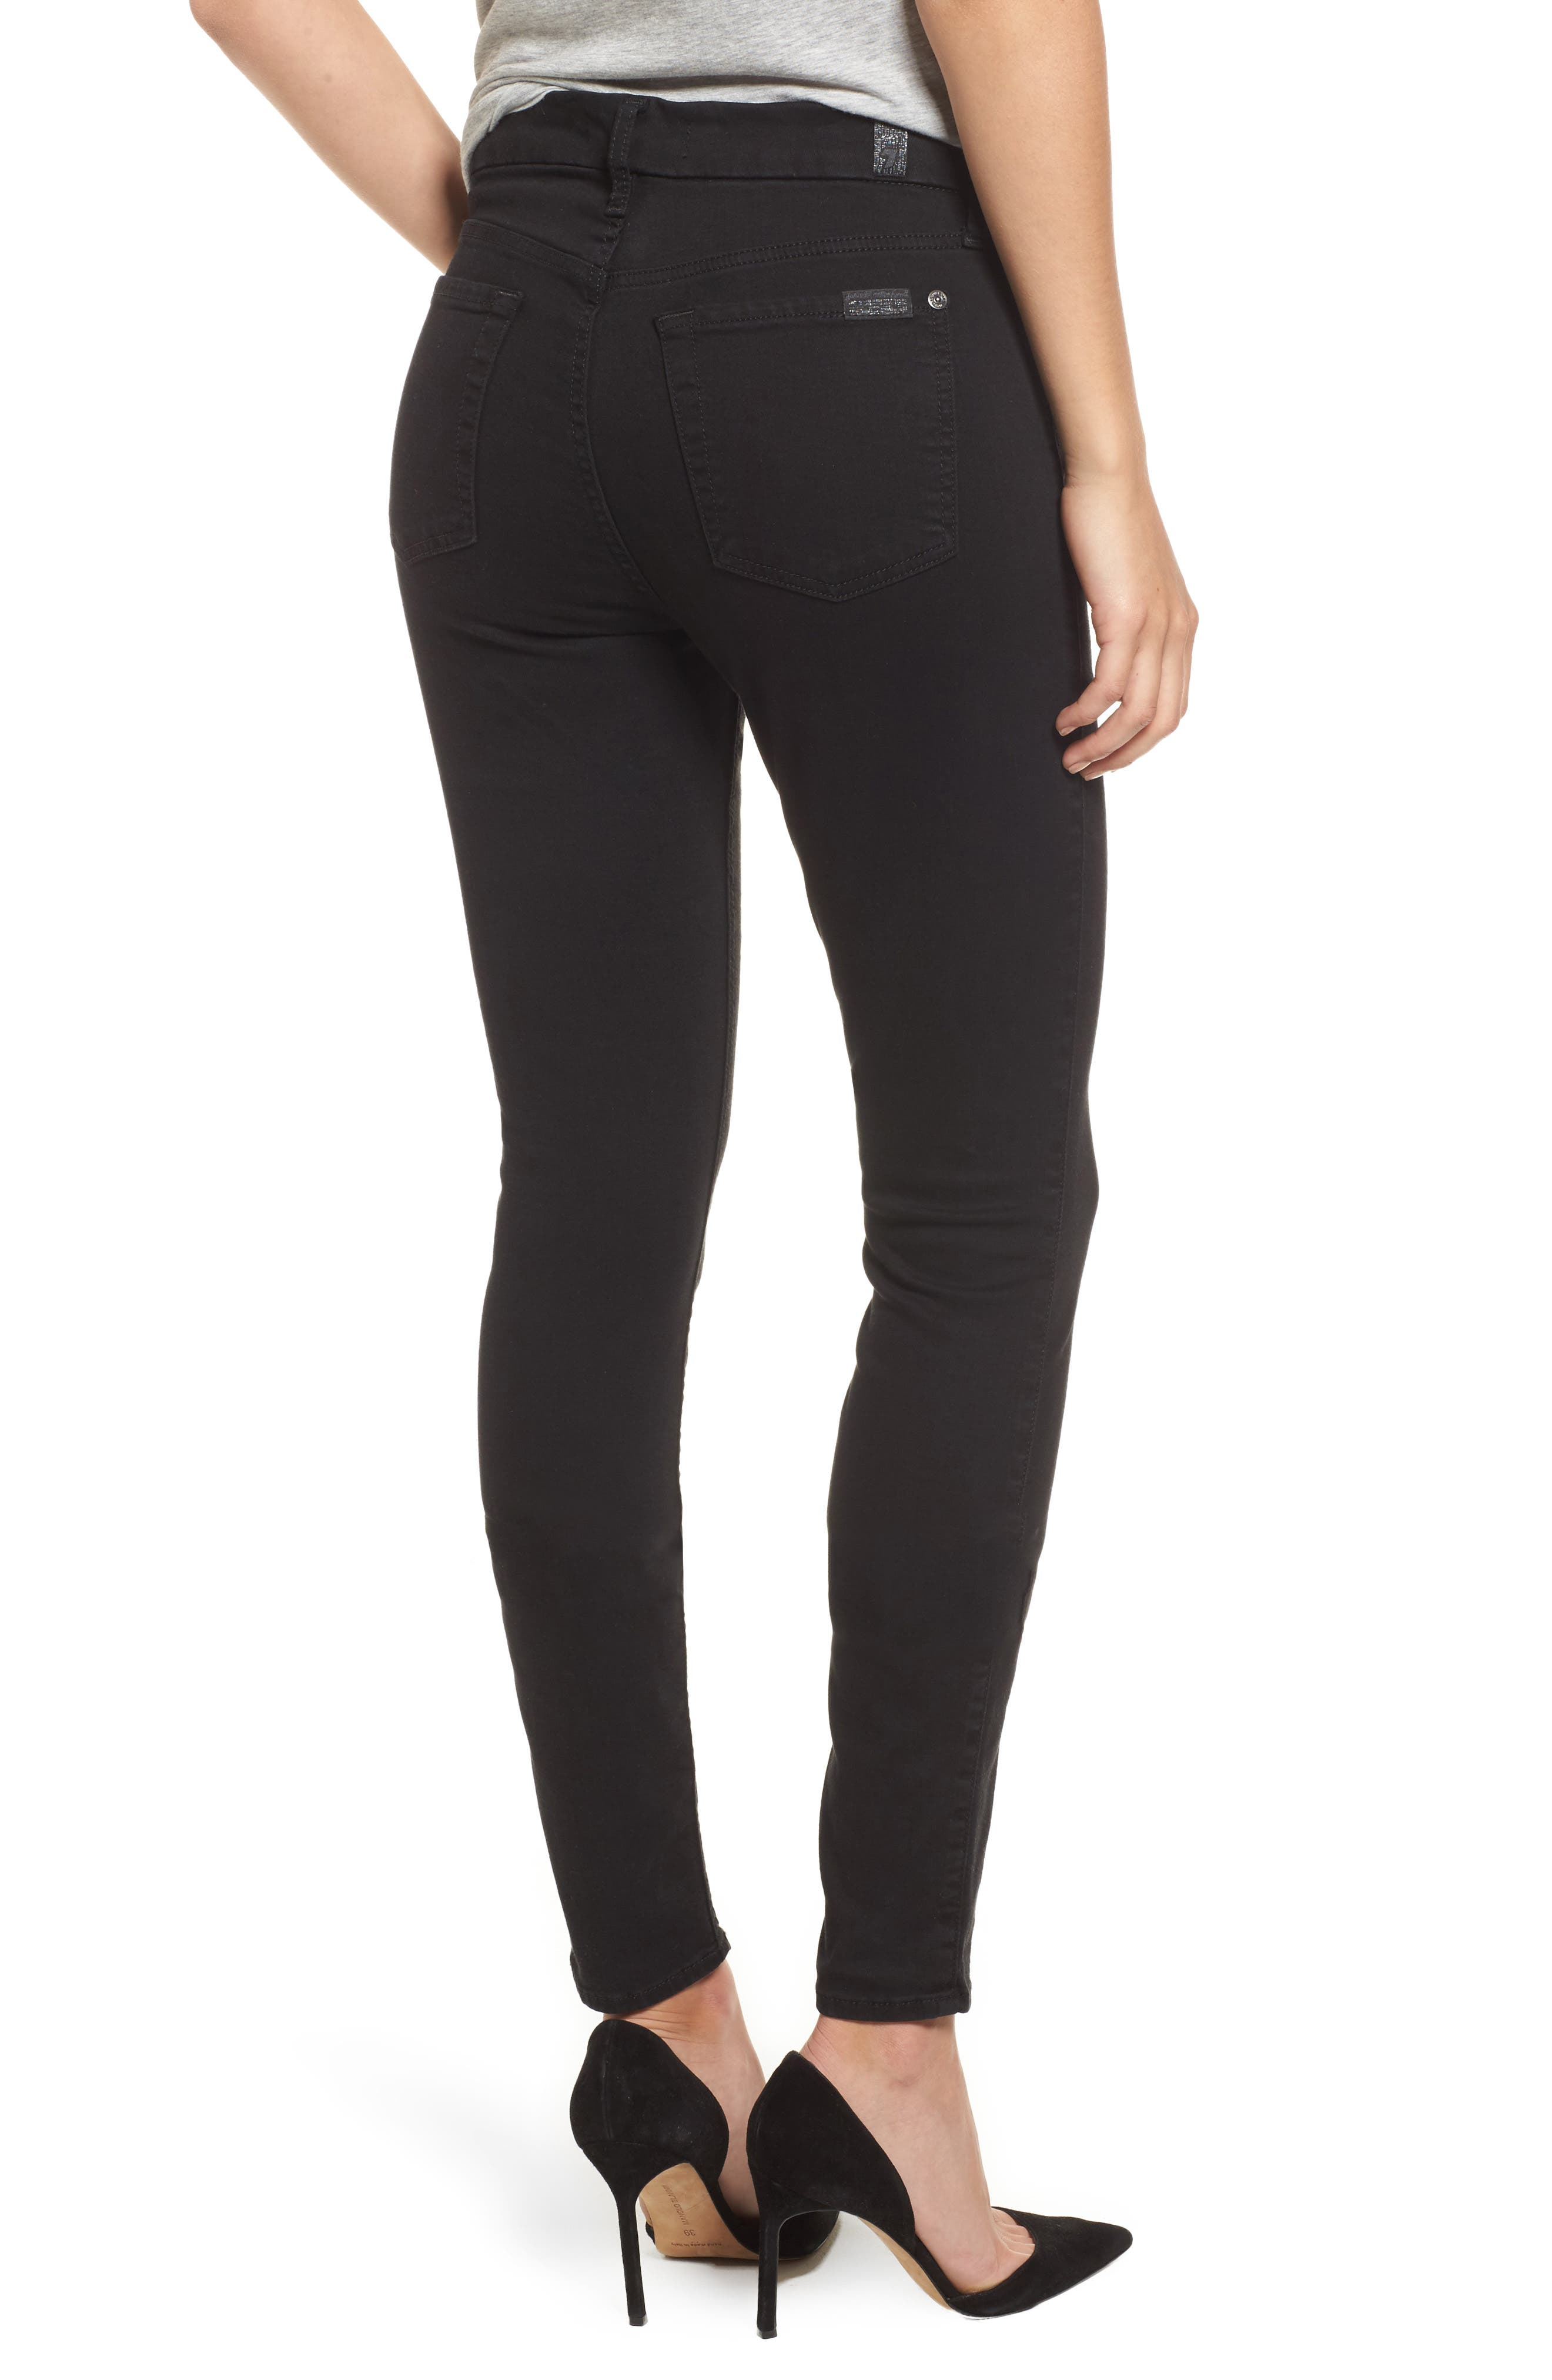 b(air) High Waist Skinny Jeans,                             Alternate thumbnail 2, color,                             B(AIR) BLACK